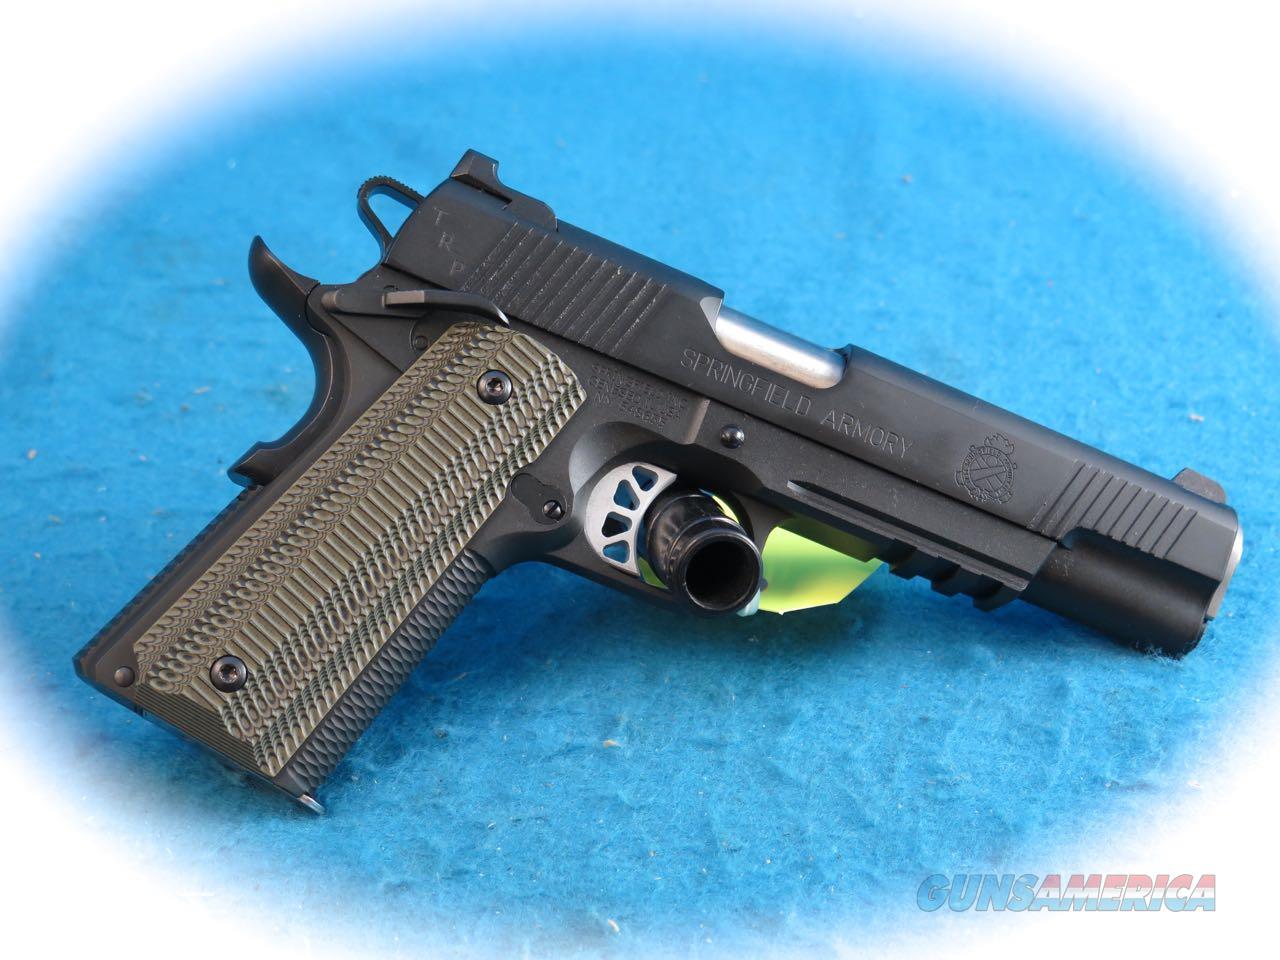 Springfield Armory TRP 10MM Operator 5 Inch Model PC9510L18 **New**  Guns > Pistols > Springfield Armory Pistols > 1911 Type